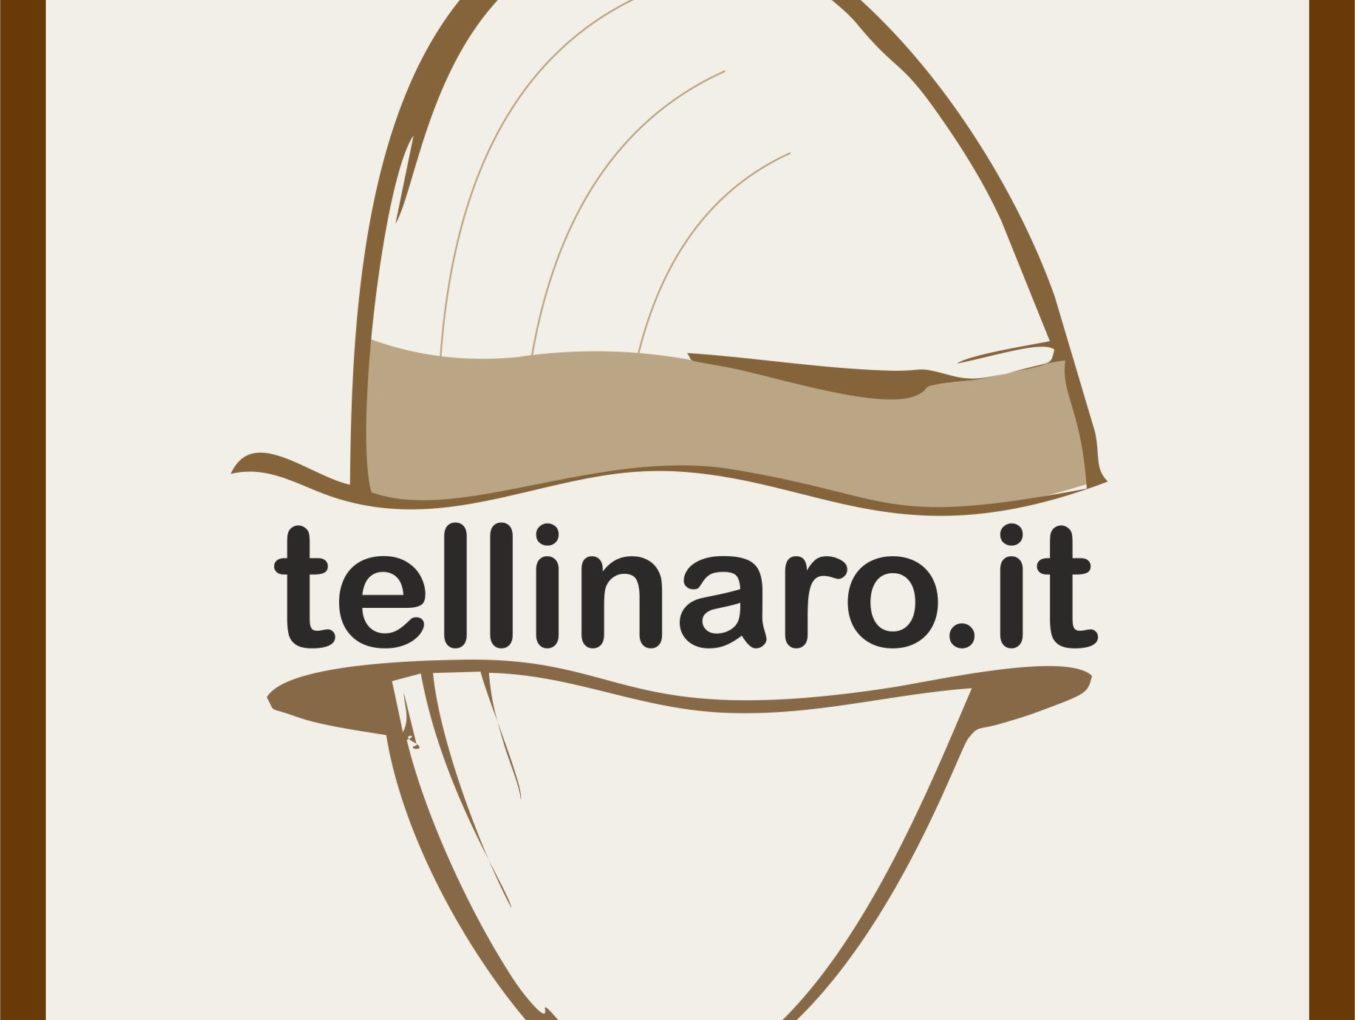 Tellinaro